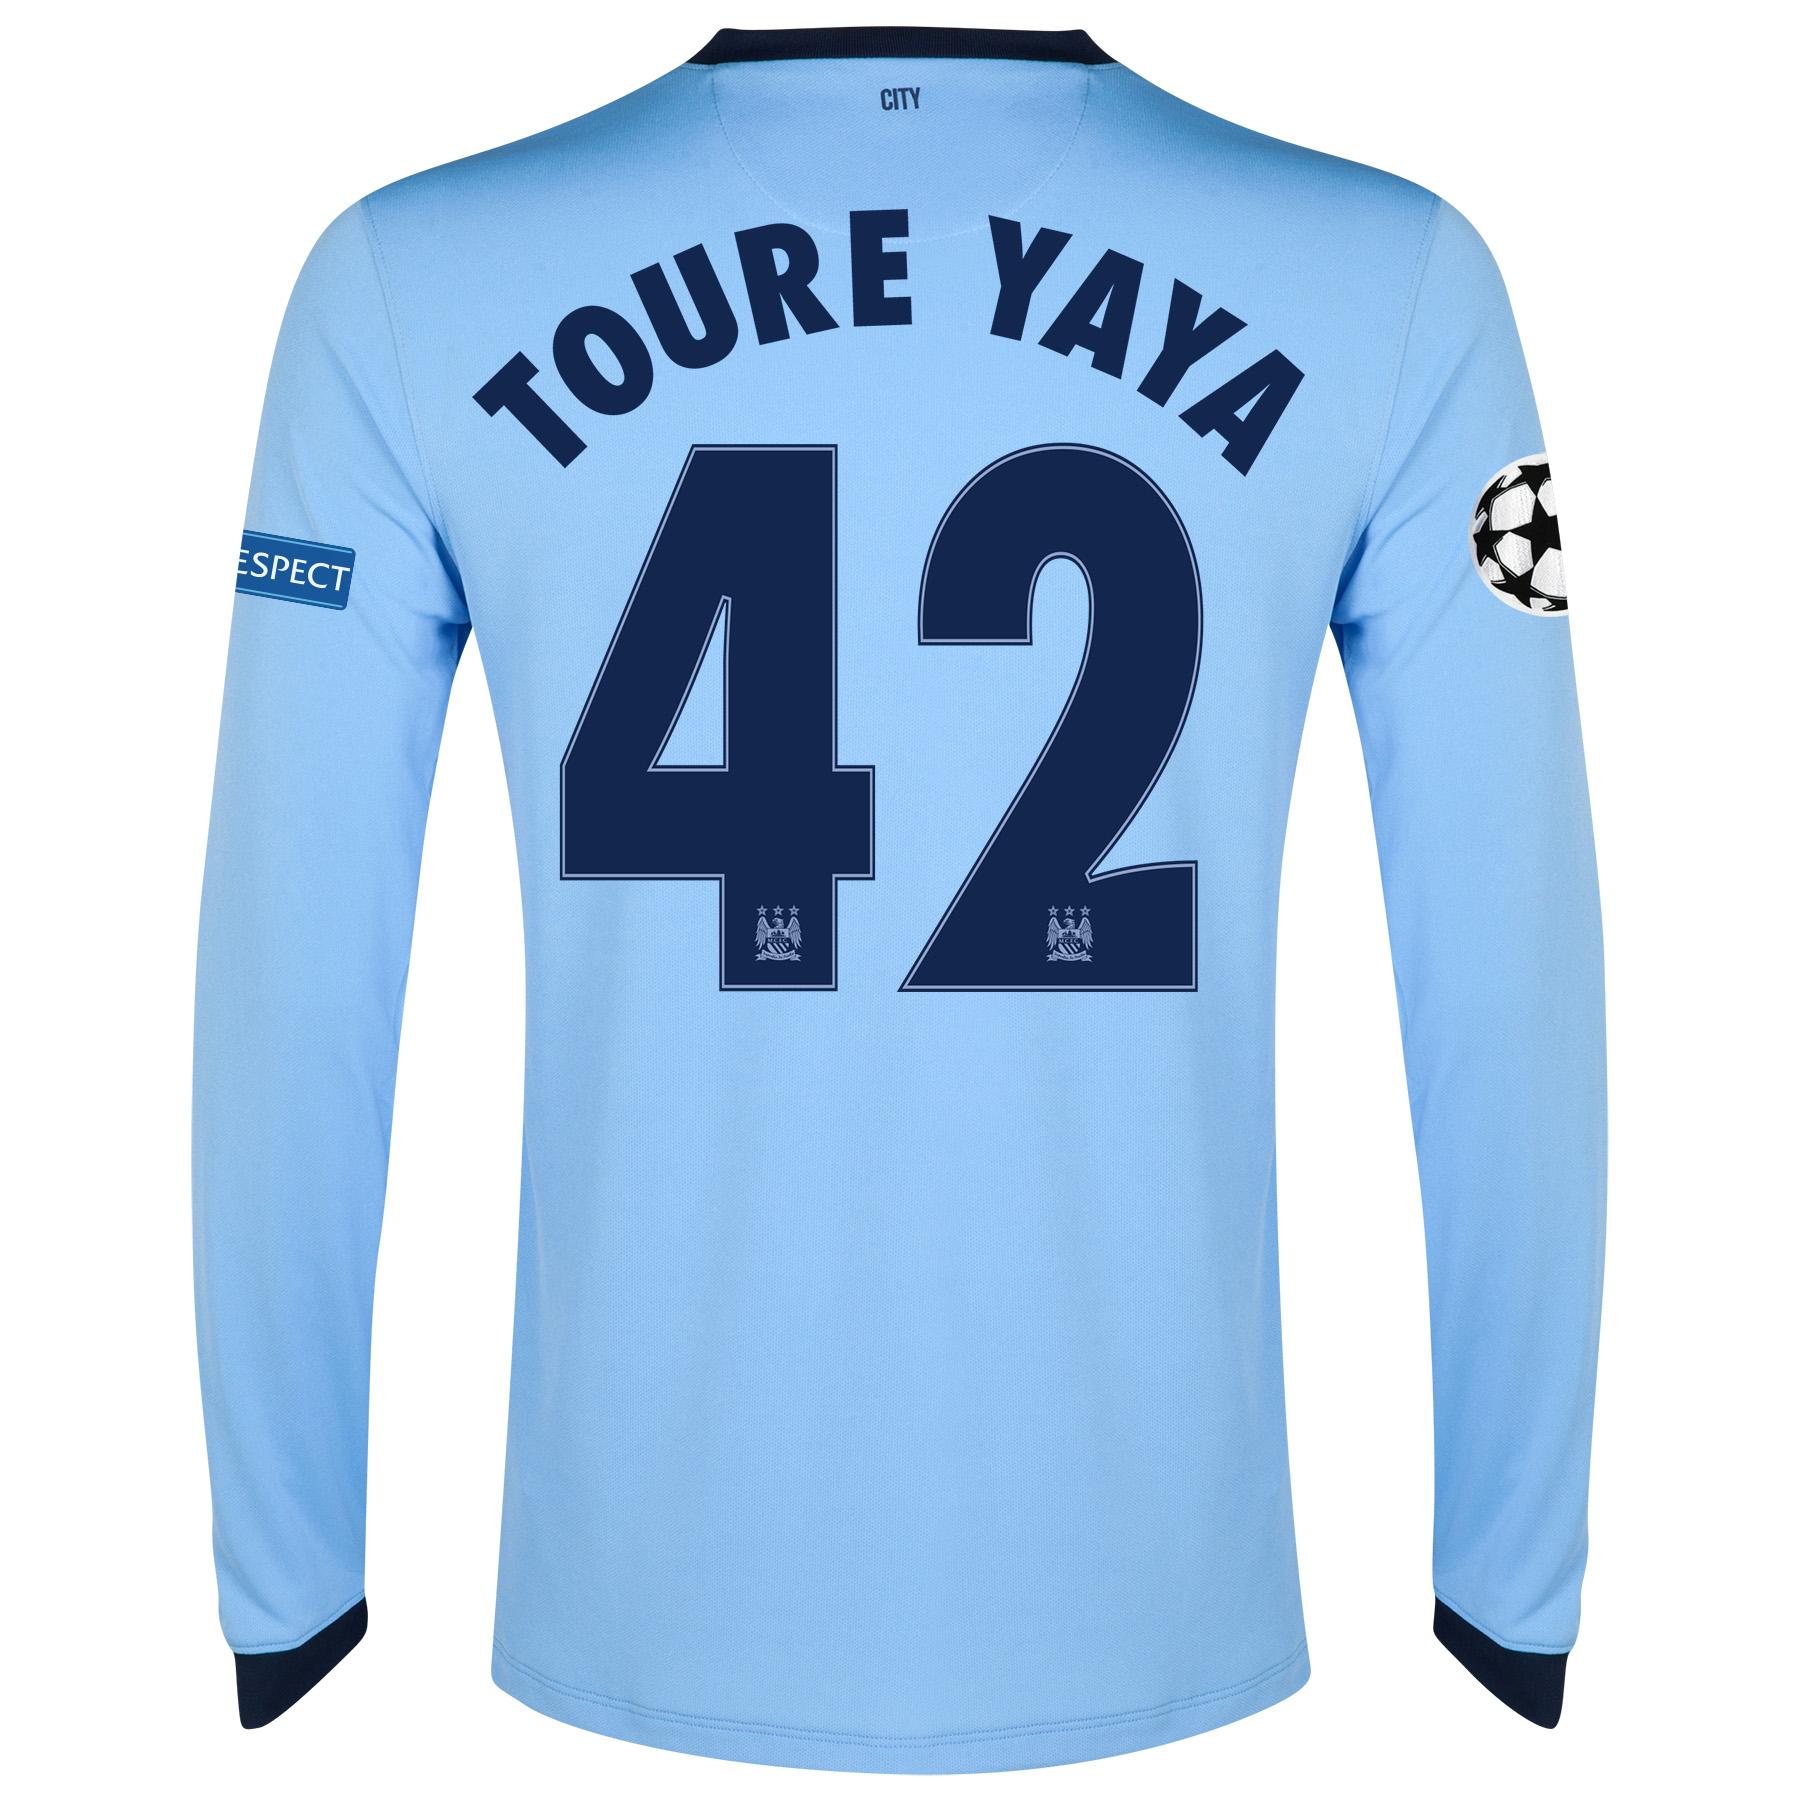 Manchester City UEFA Champions League Home Shirt 2014/15 - Long Sleeve - Kids Sky Blue with Toure Yaya 42 printing